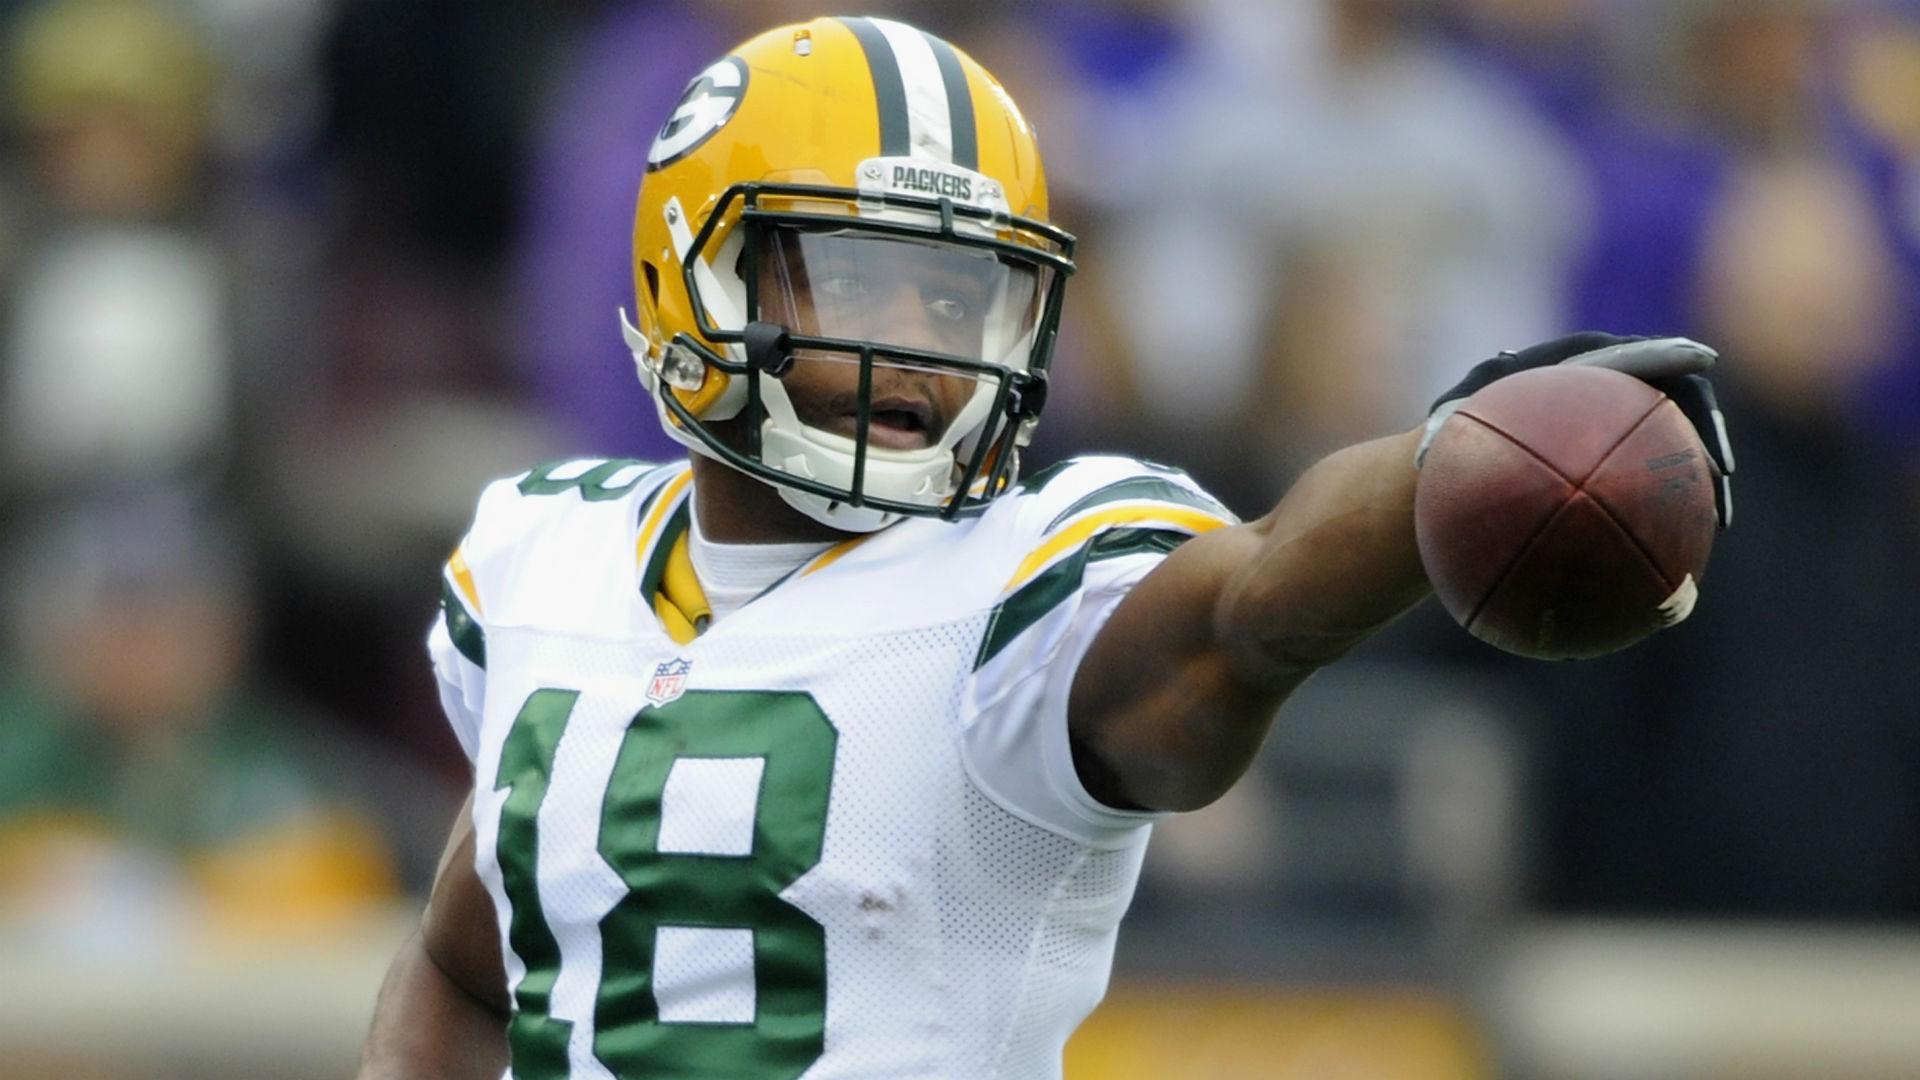 RandallCobb - WR - Green Bay Packers